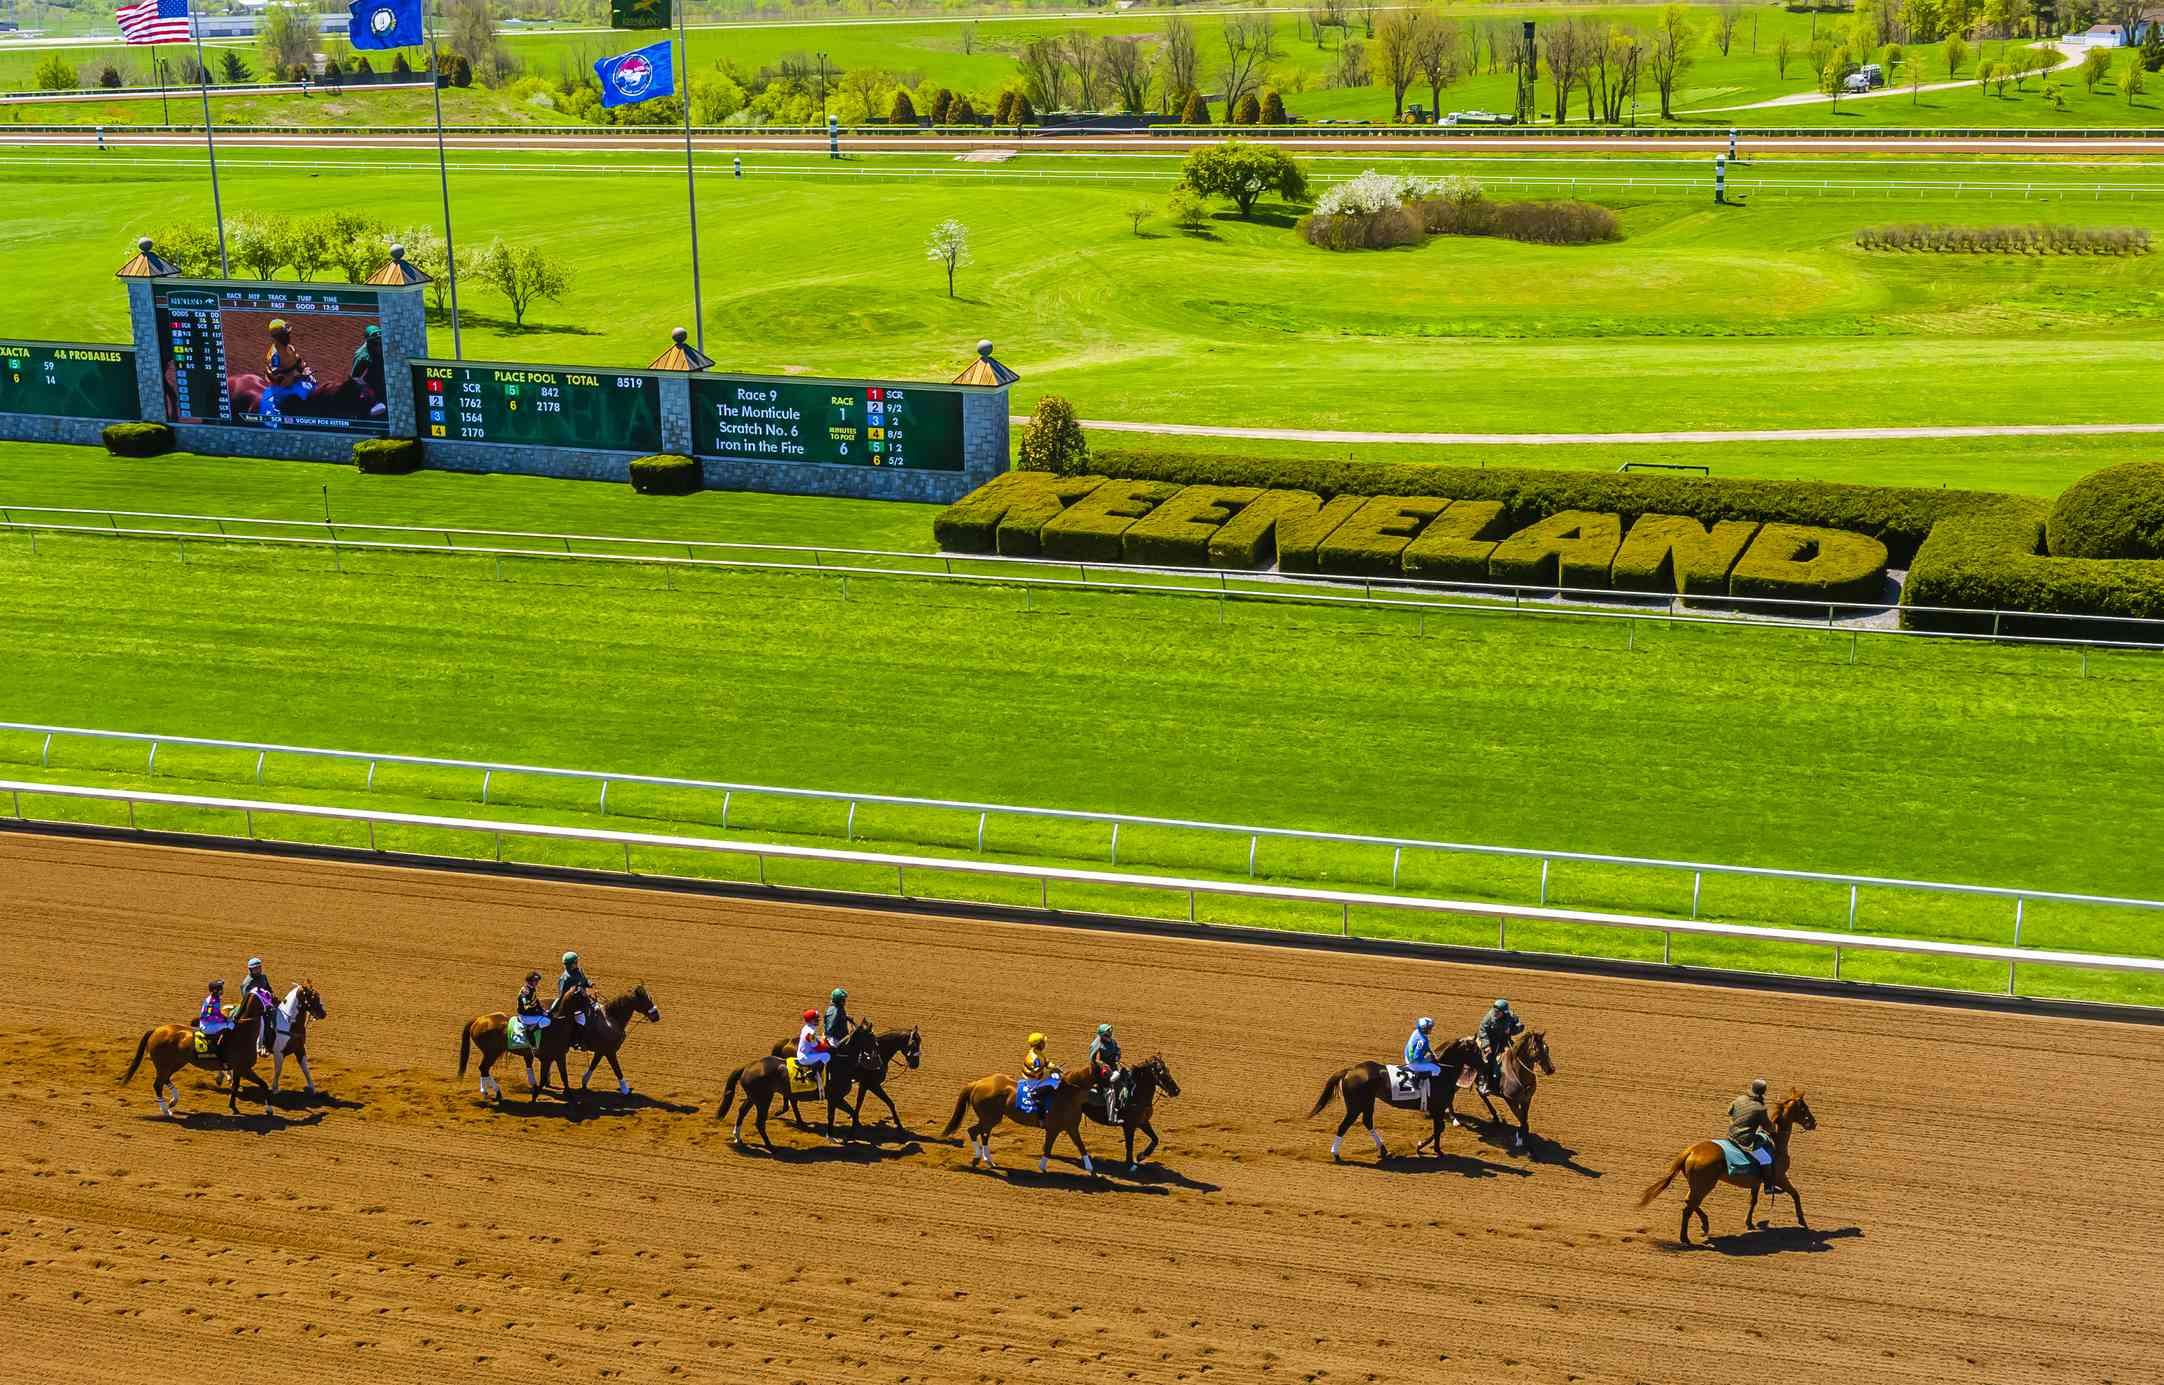 Horses racing at Keeneland Track in Lexington, Kentucky